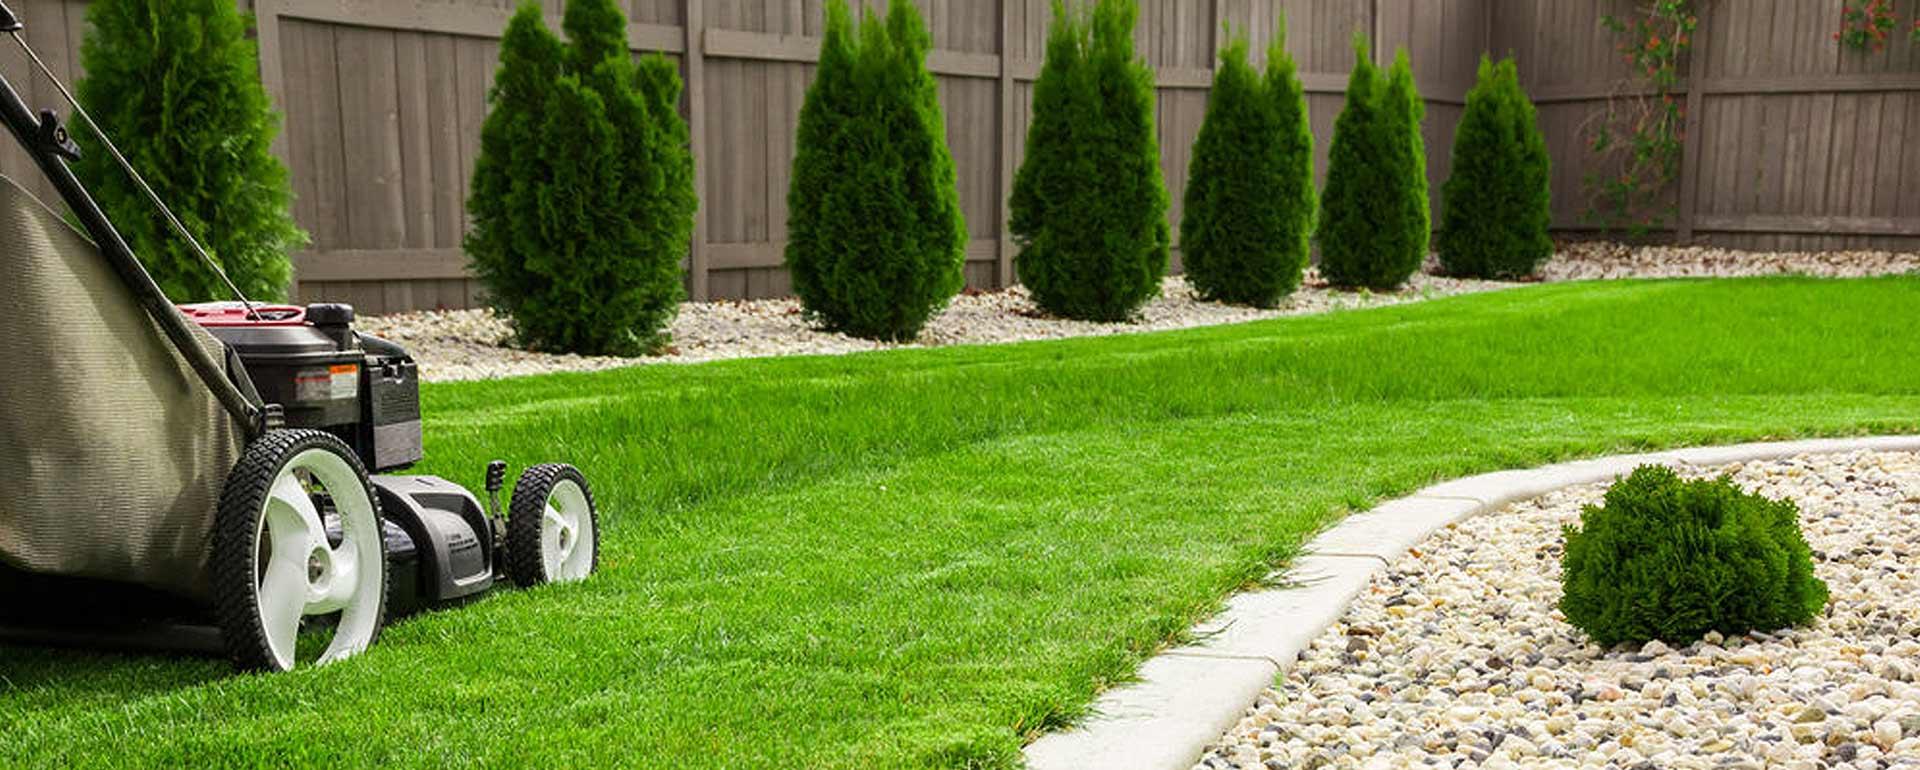 A green lawn in a backyard.